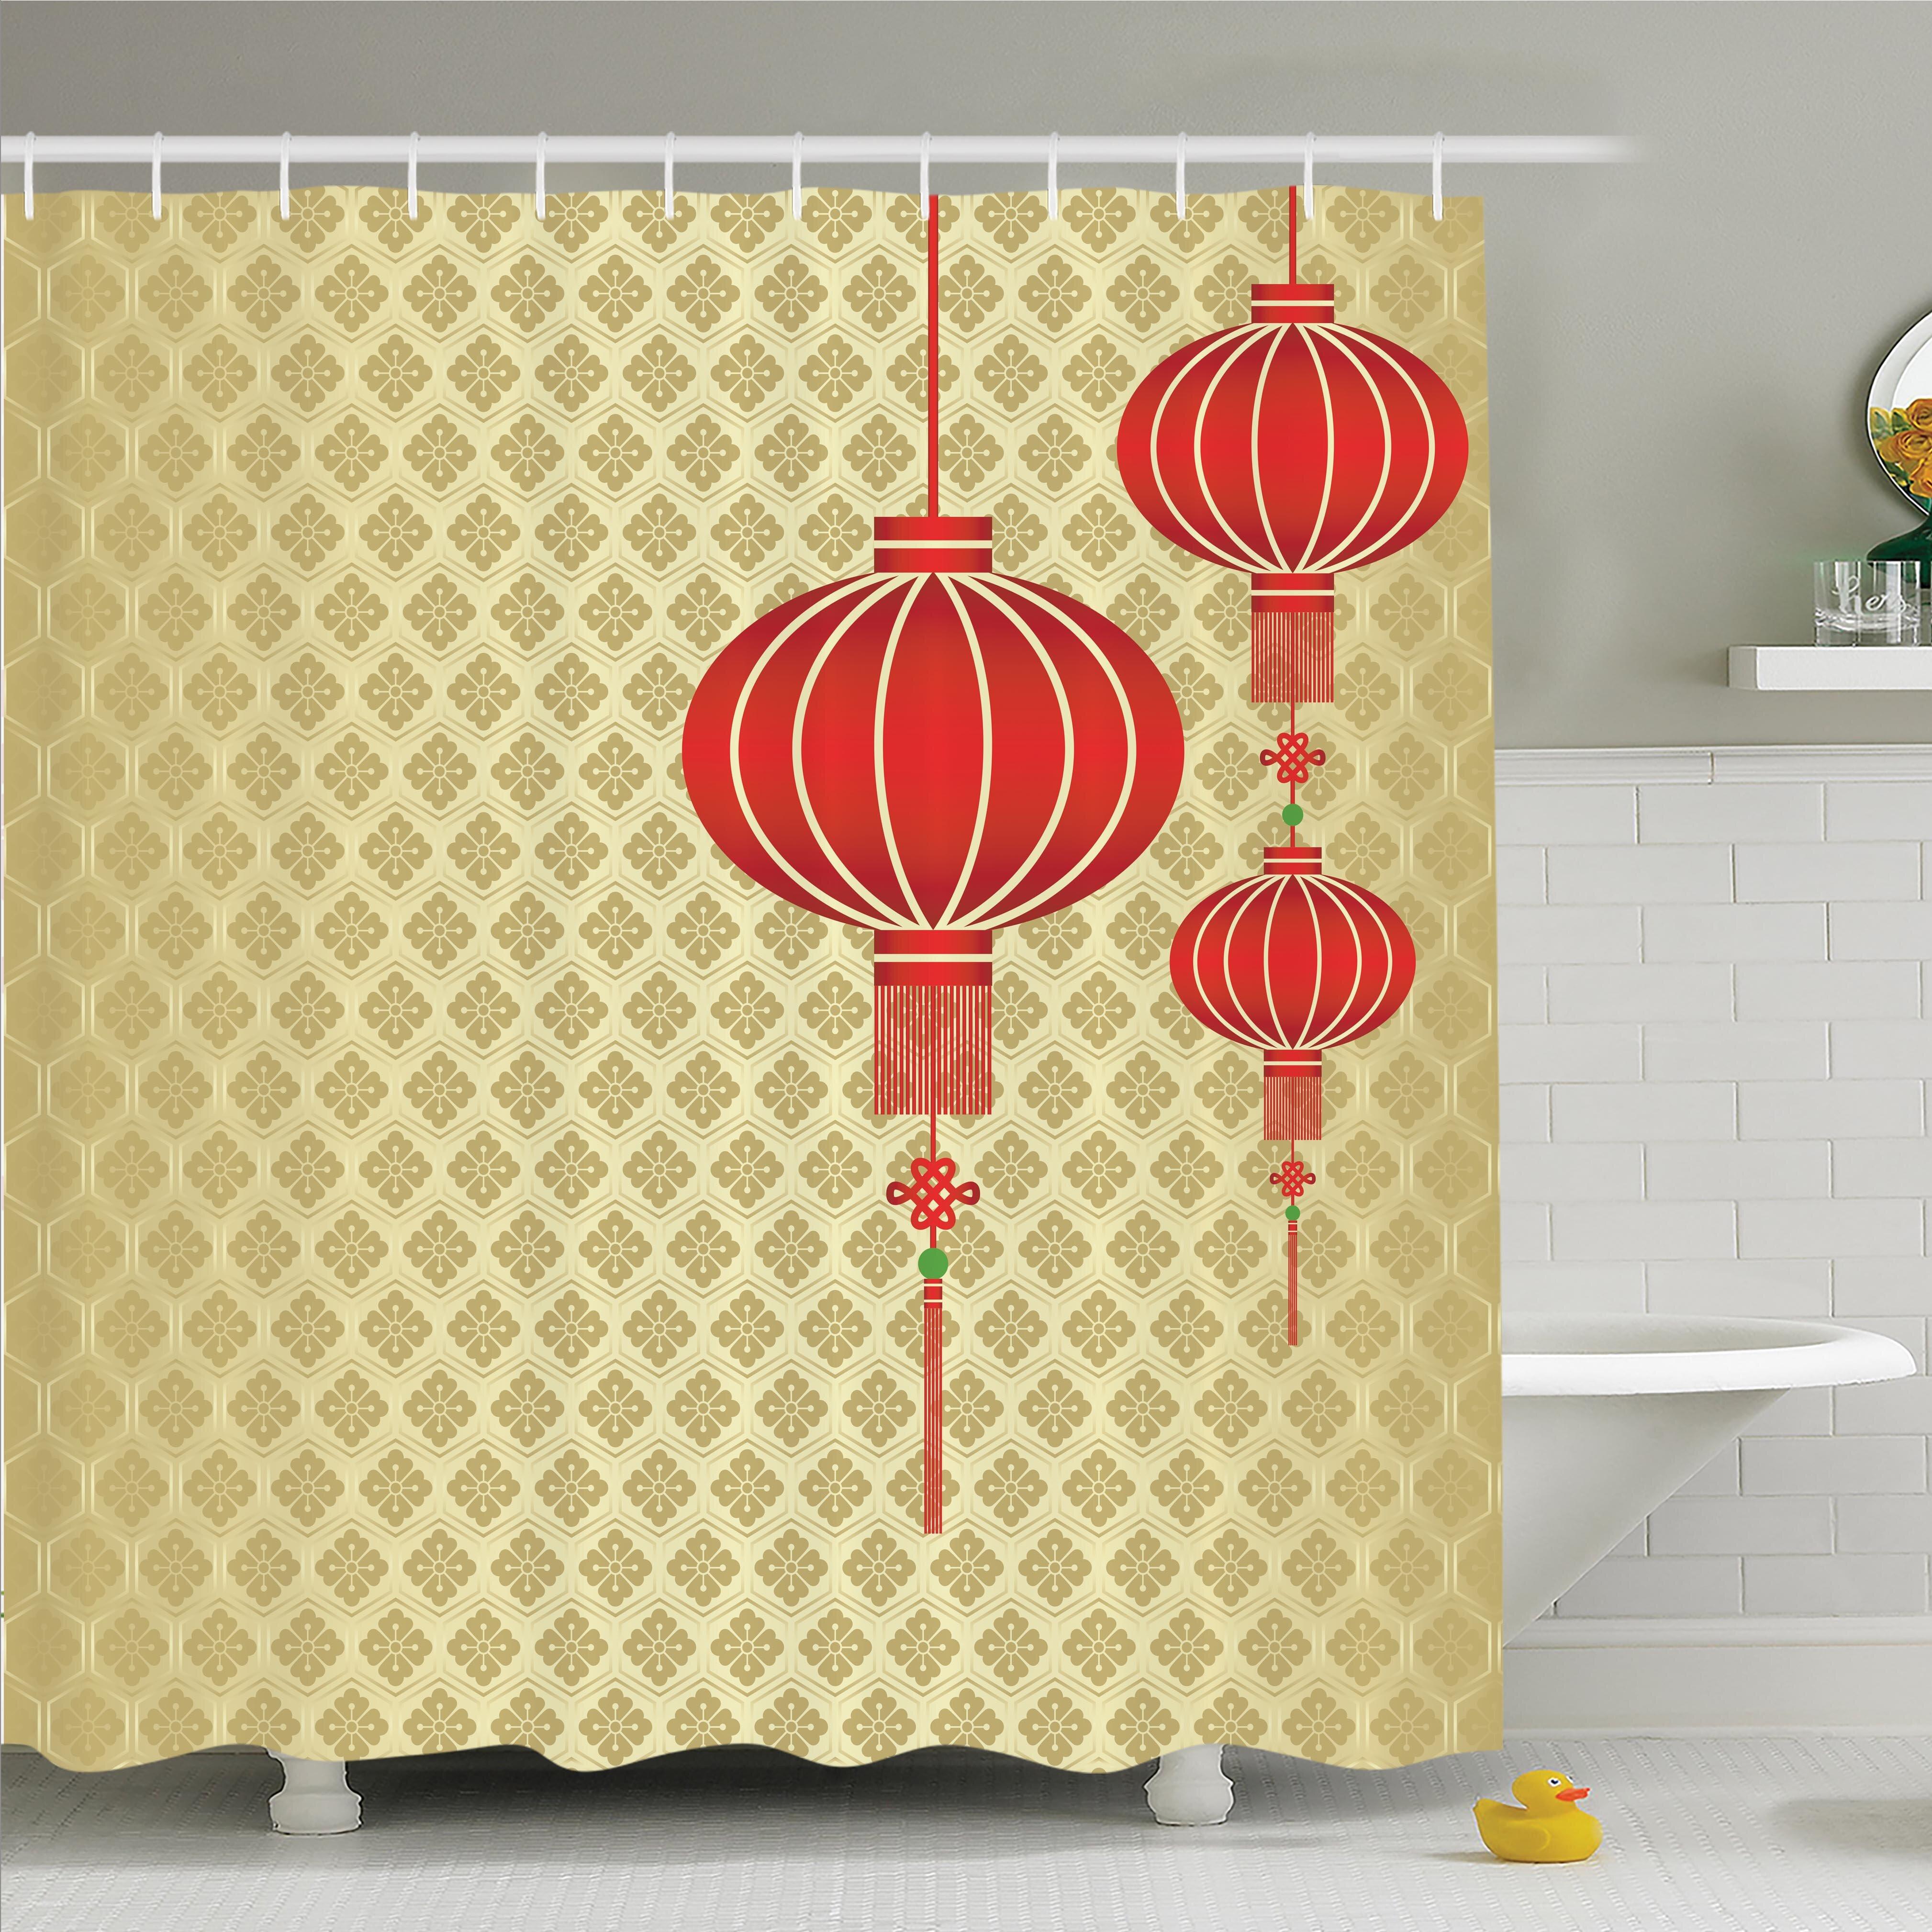 Ambesonne Chinese Lantern Baroque Artsy Shower Curtain Set